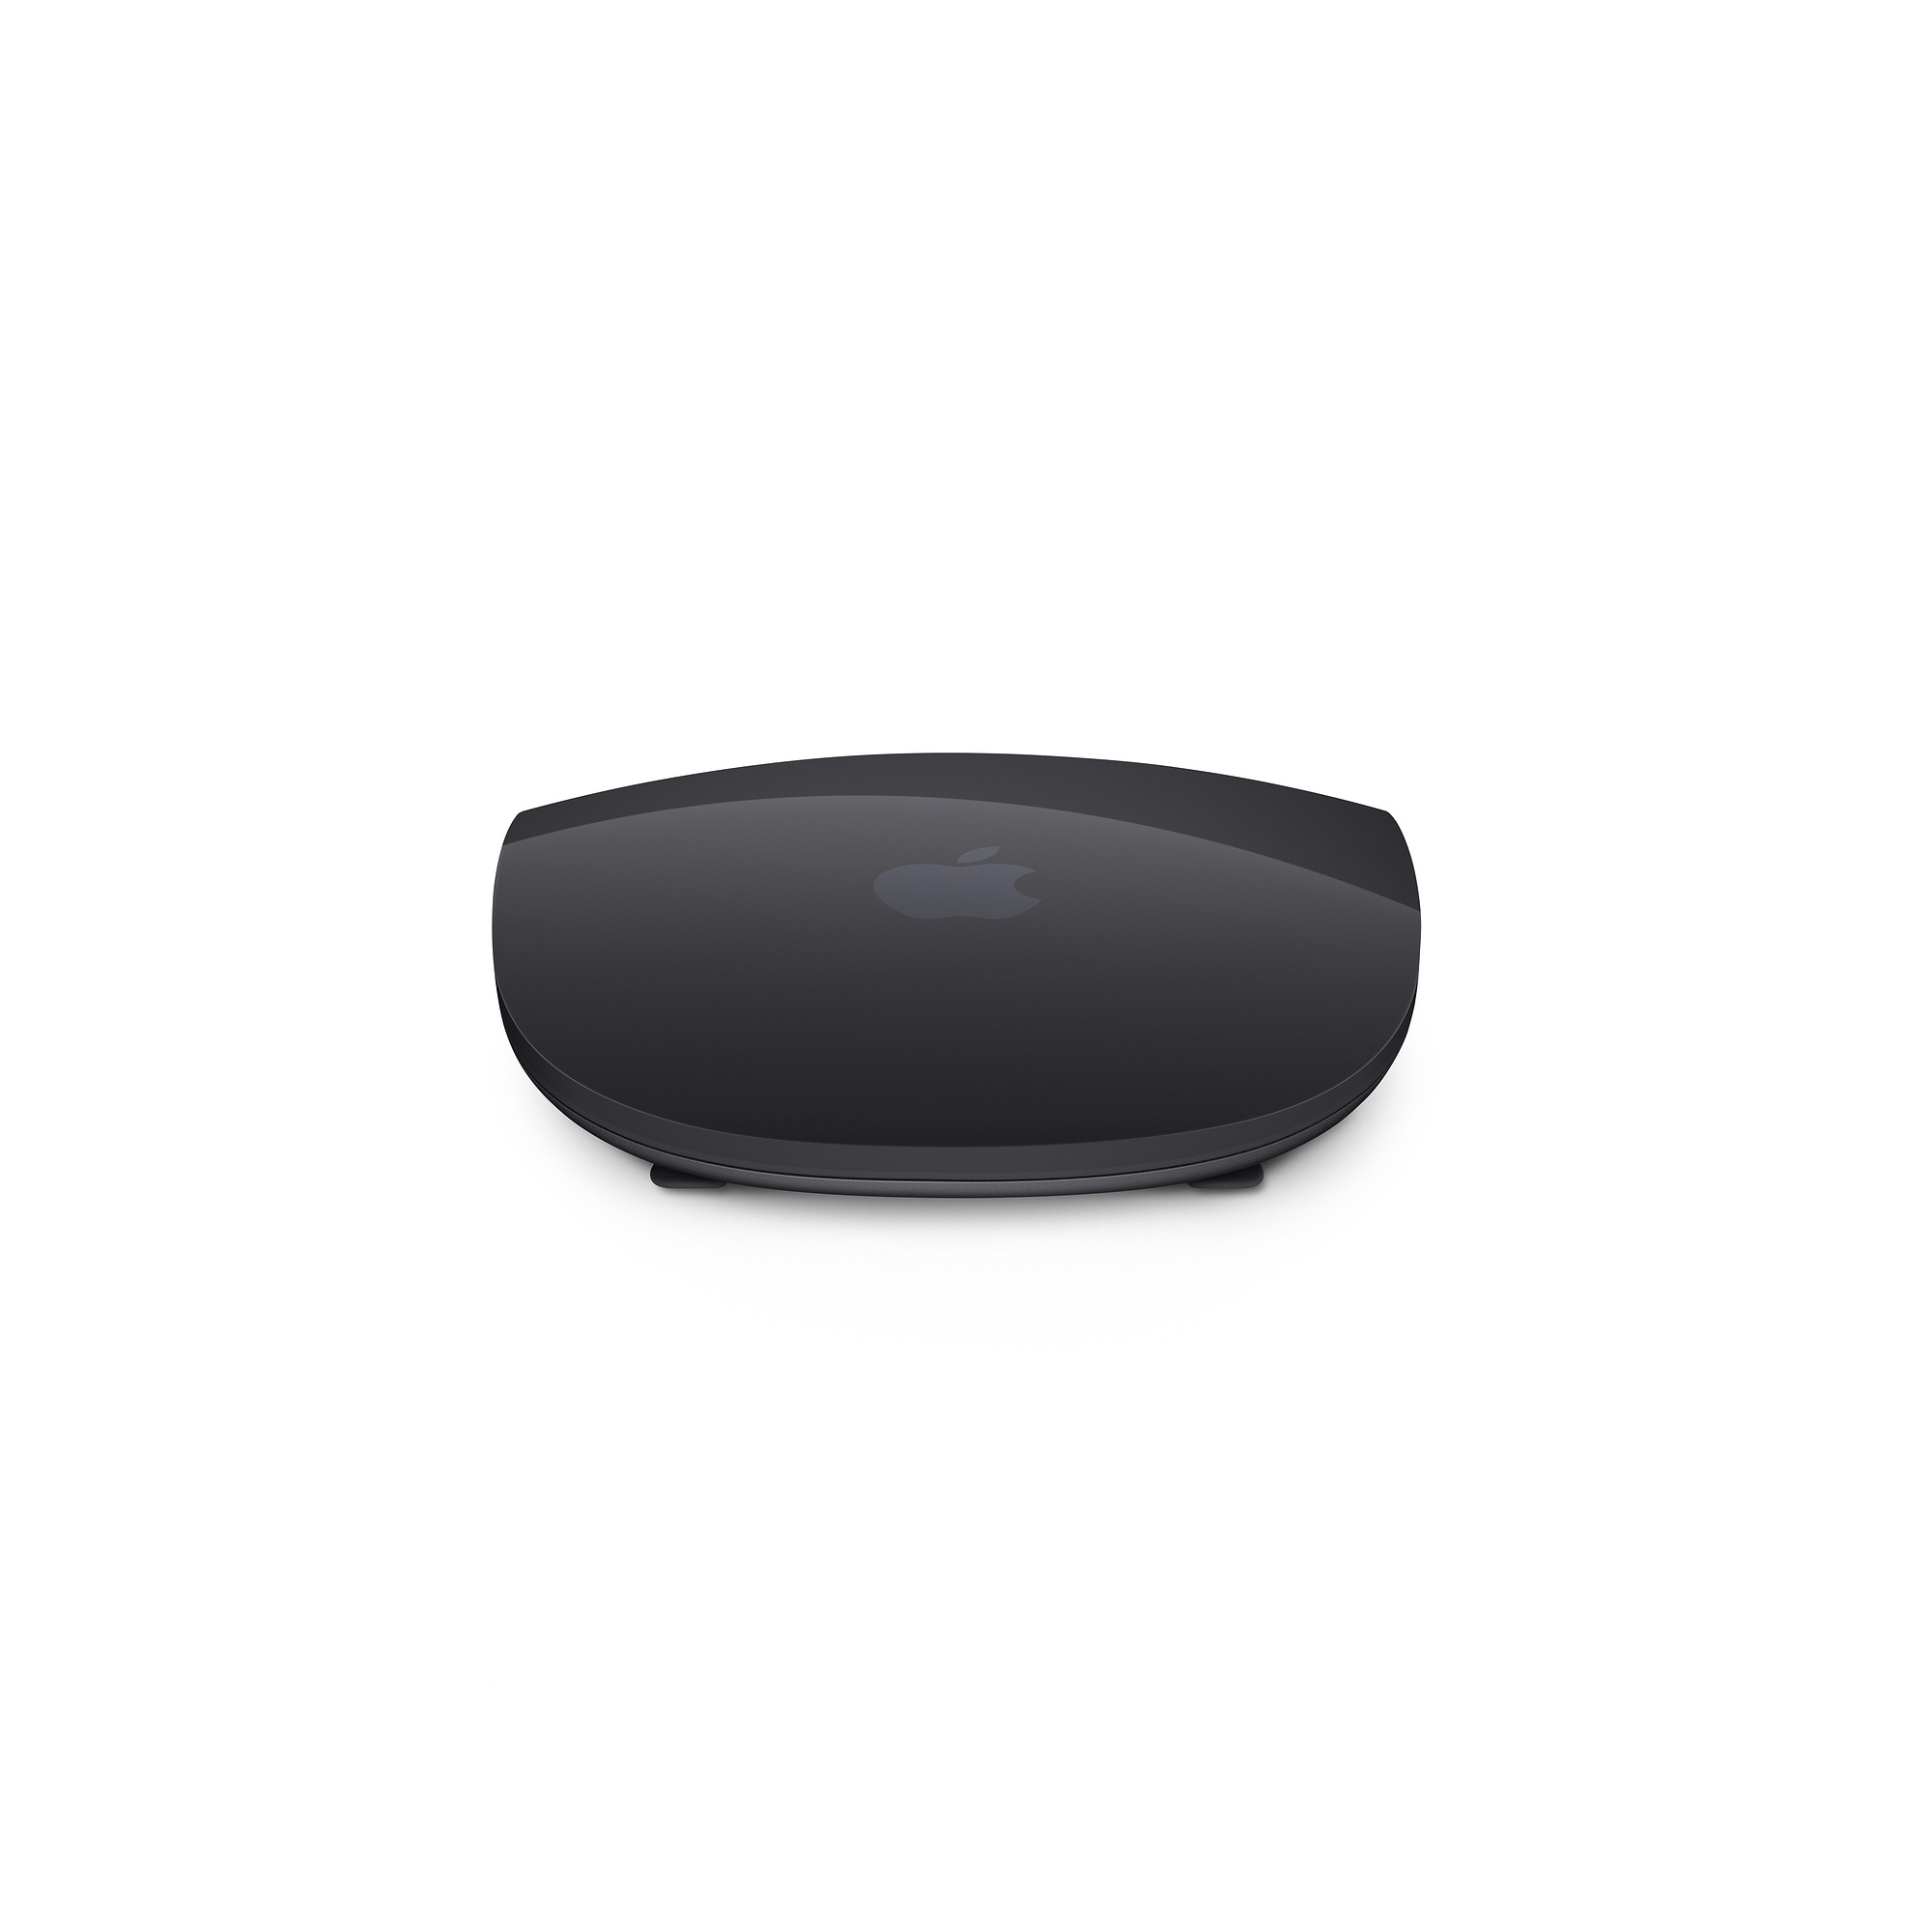 Apple Magic Mouse 2 - Spacegrijs